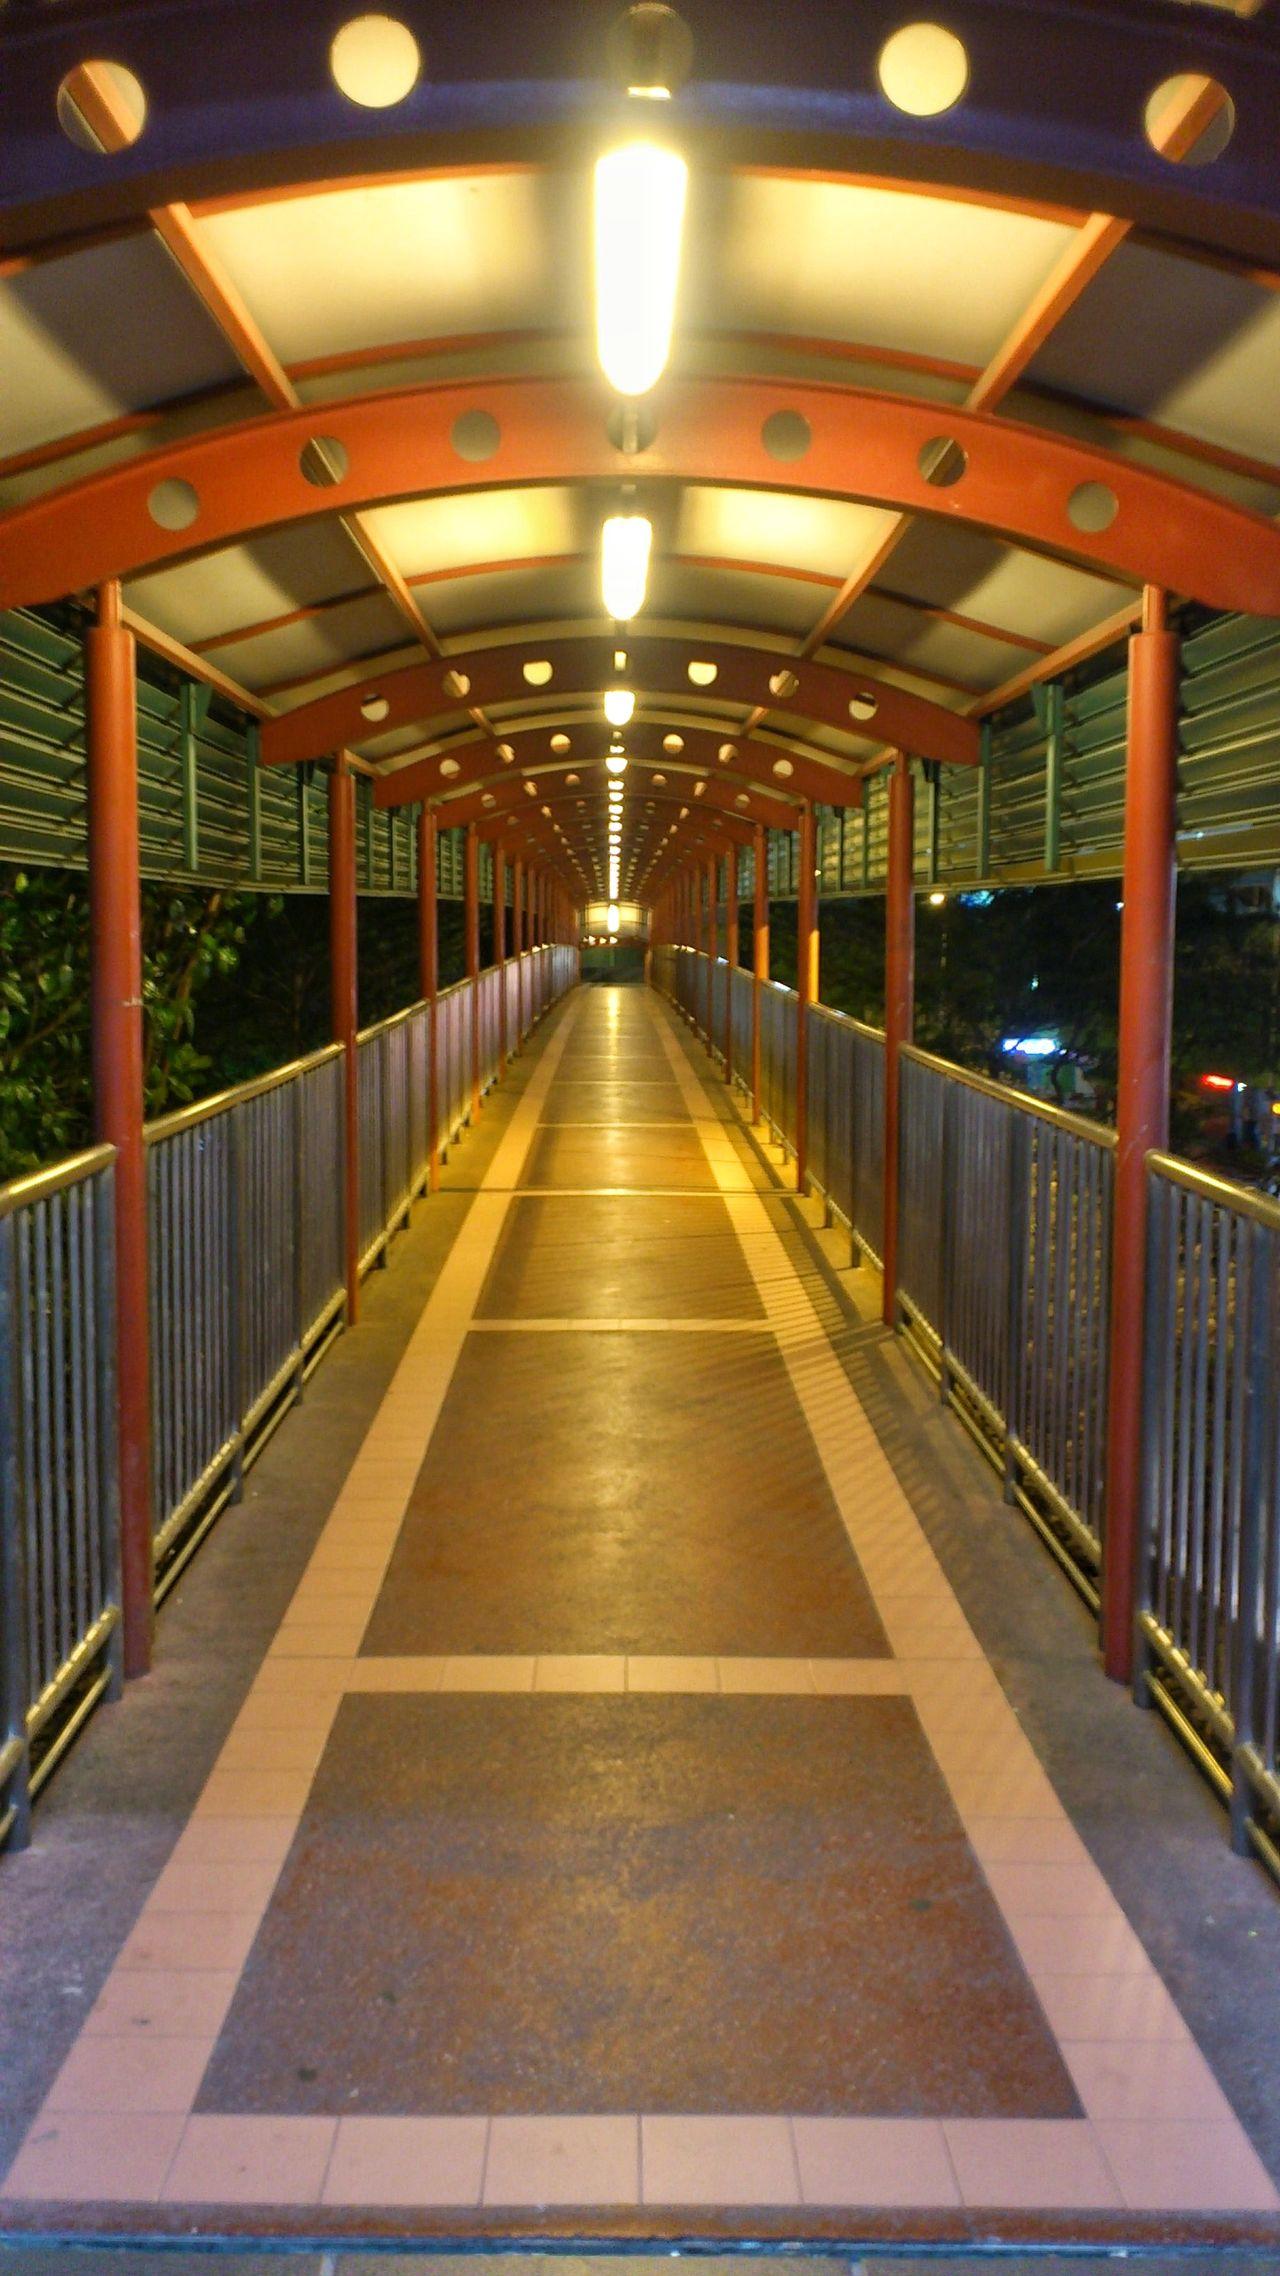 Overhead bridge between Eu Tong Sen Stree (People's Park Shopping) & Chinatown Food Court. Snapseed Connection Bridge Nightshot Nightlights Bridge - Man Made Structure Smartphonephotography Sonyxperiaphotography Mobilephotography Nightphotography